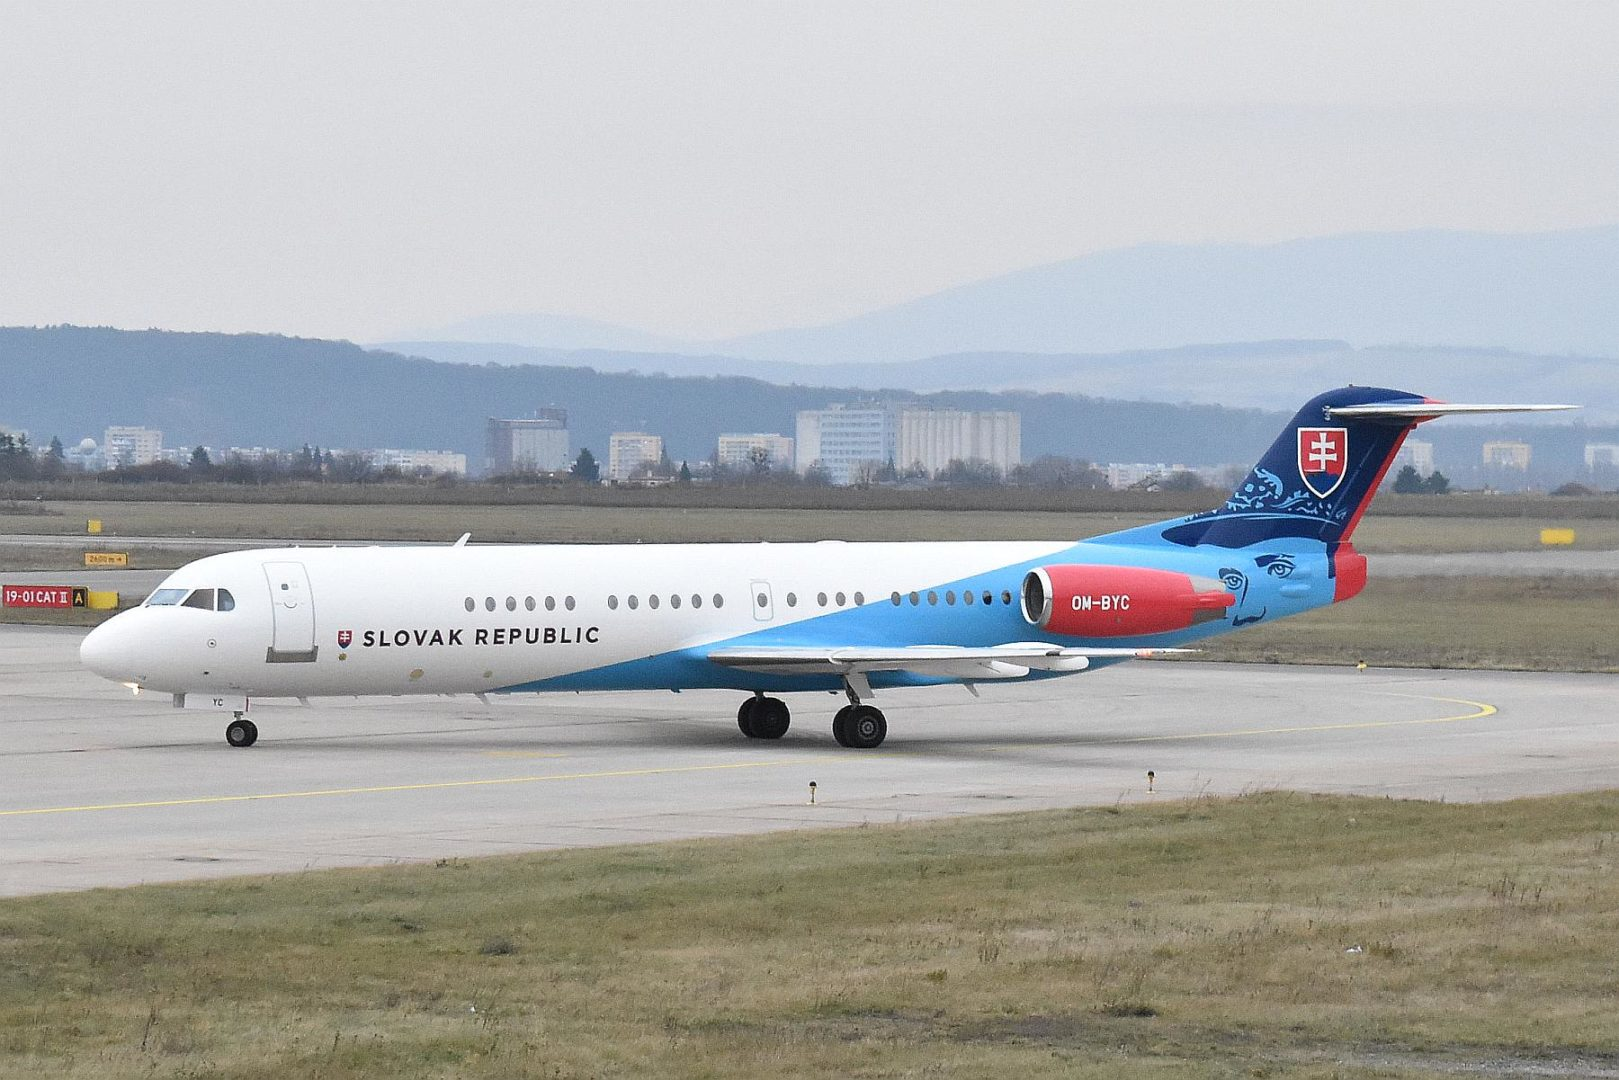 Vládne špeciály_Fokker 100 OM-BYC Slovak rep.